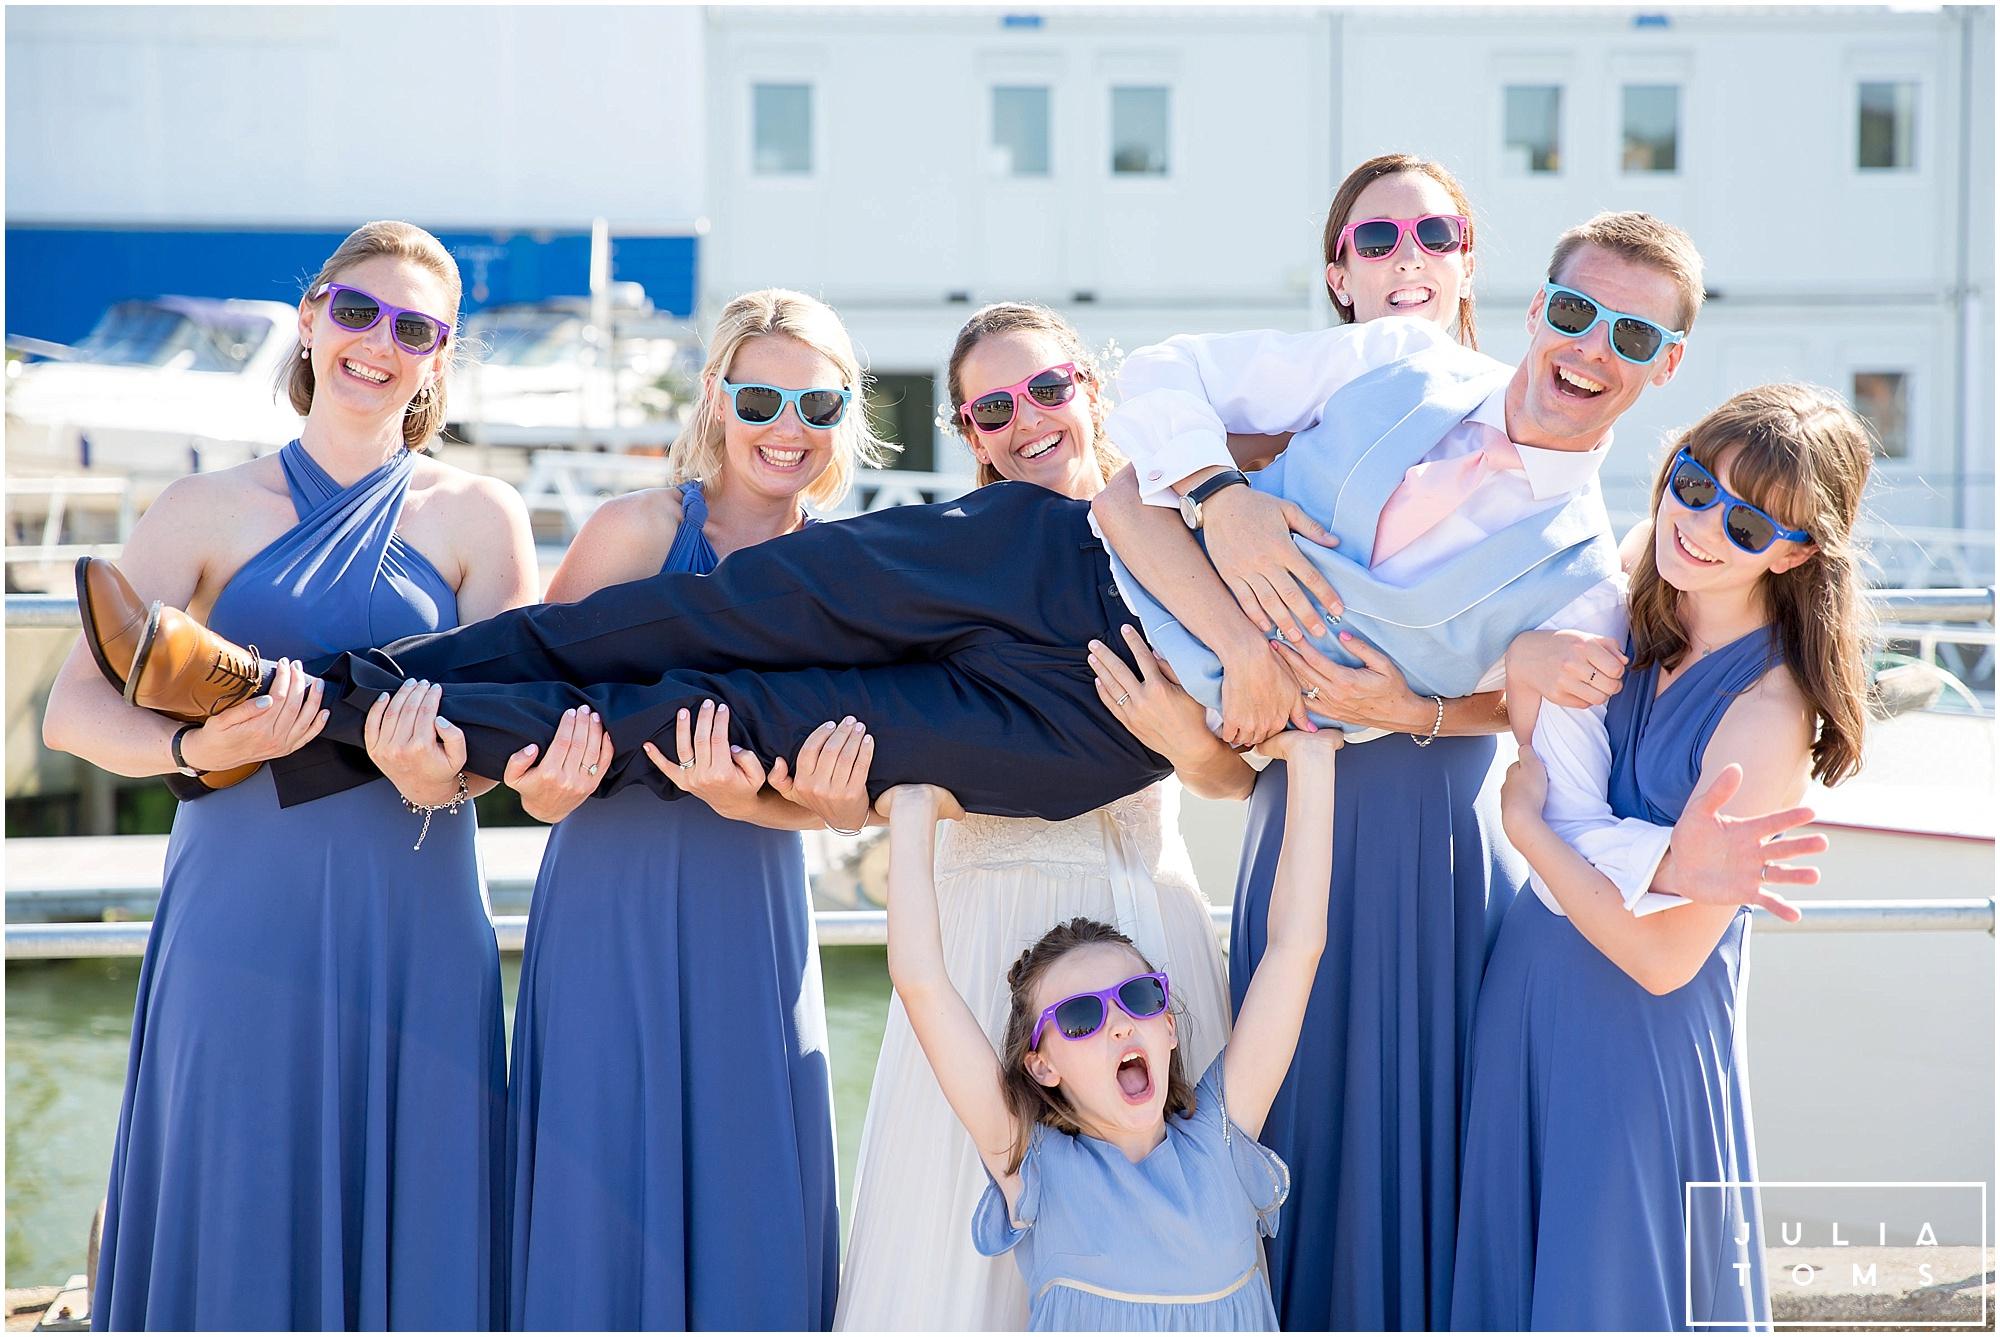 julia_toms_chichester_wedding_photographer_portsmouth_047.jpg